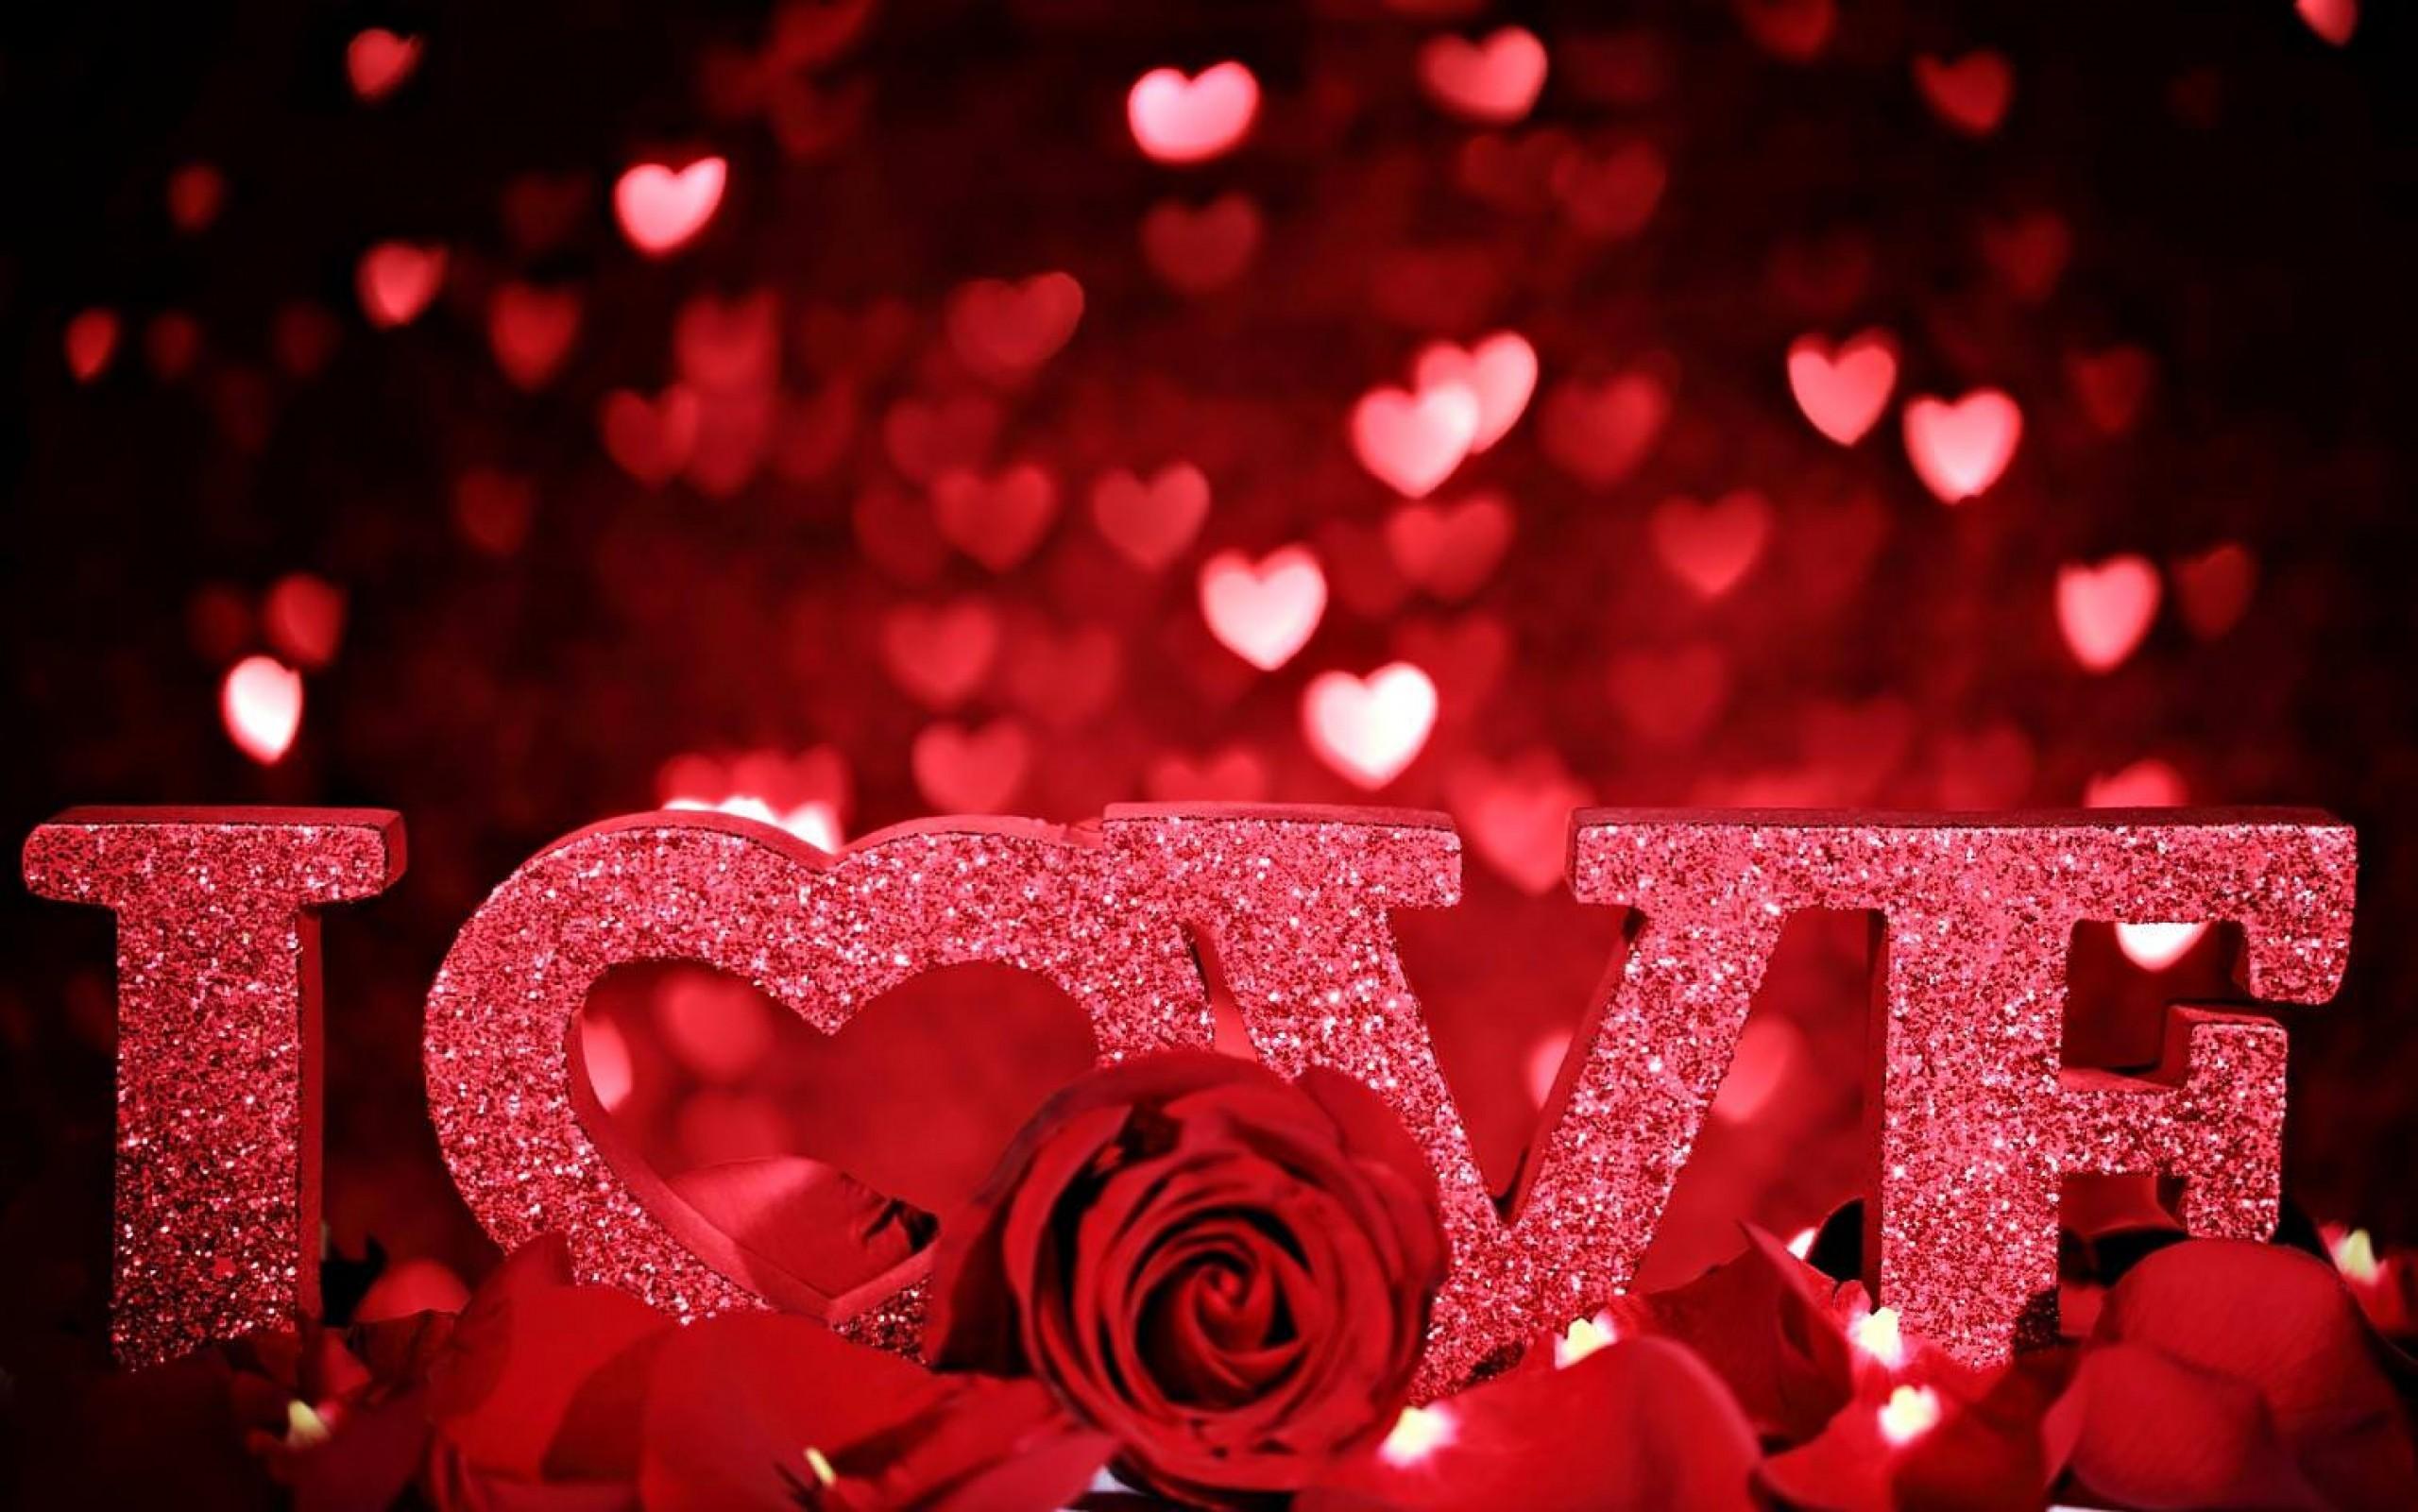 Love Hearts Hd Wallpapers